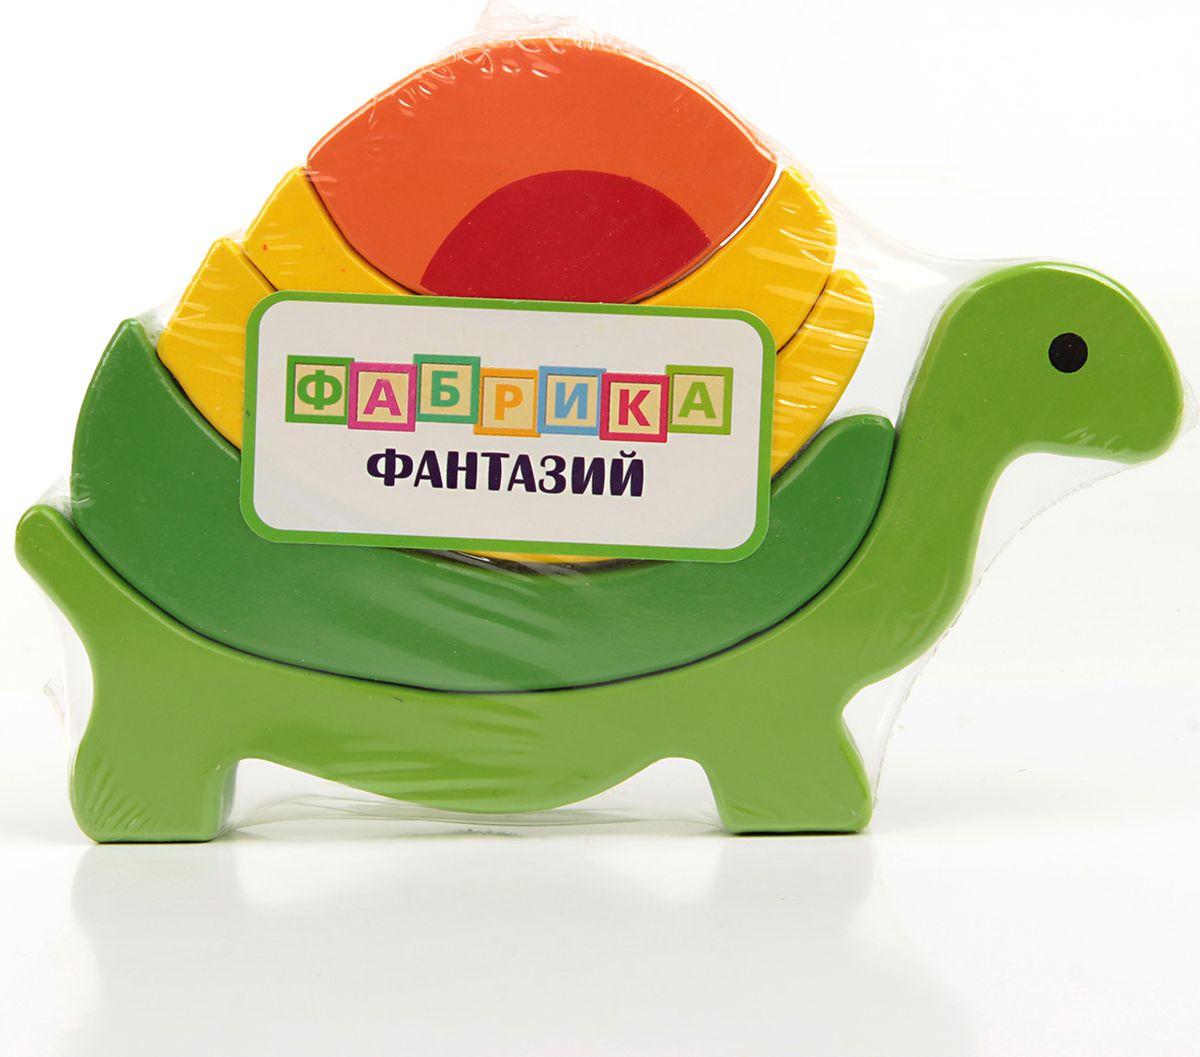 Фабрика Фантазий Развивающая игрушка Баланс 60093